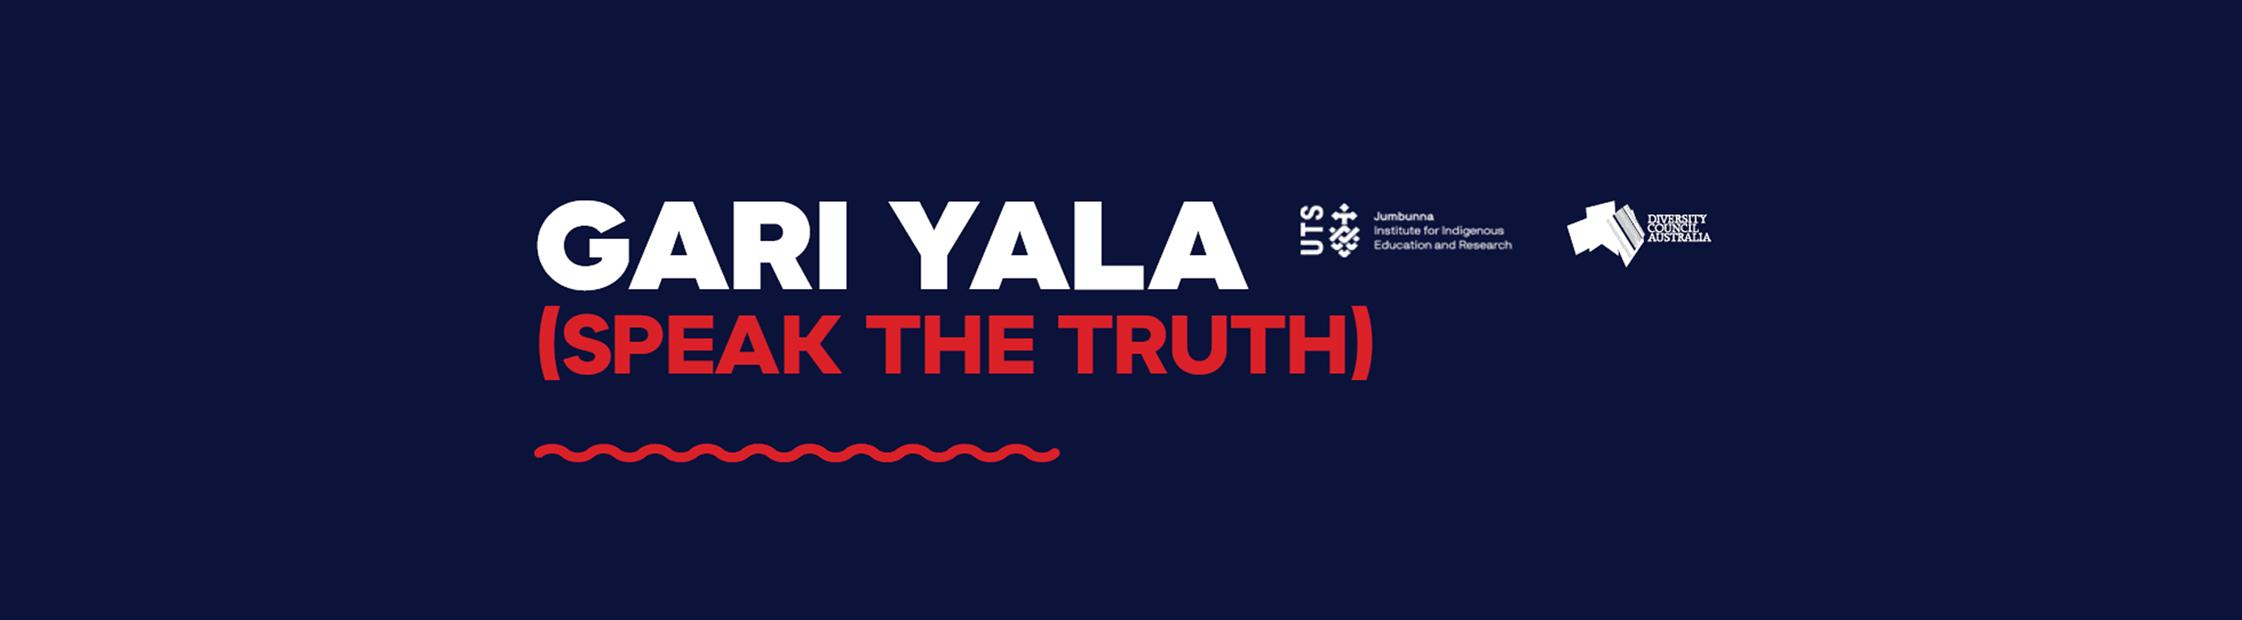 Gari yala (Speak the truth)